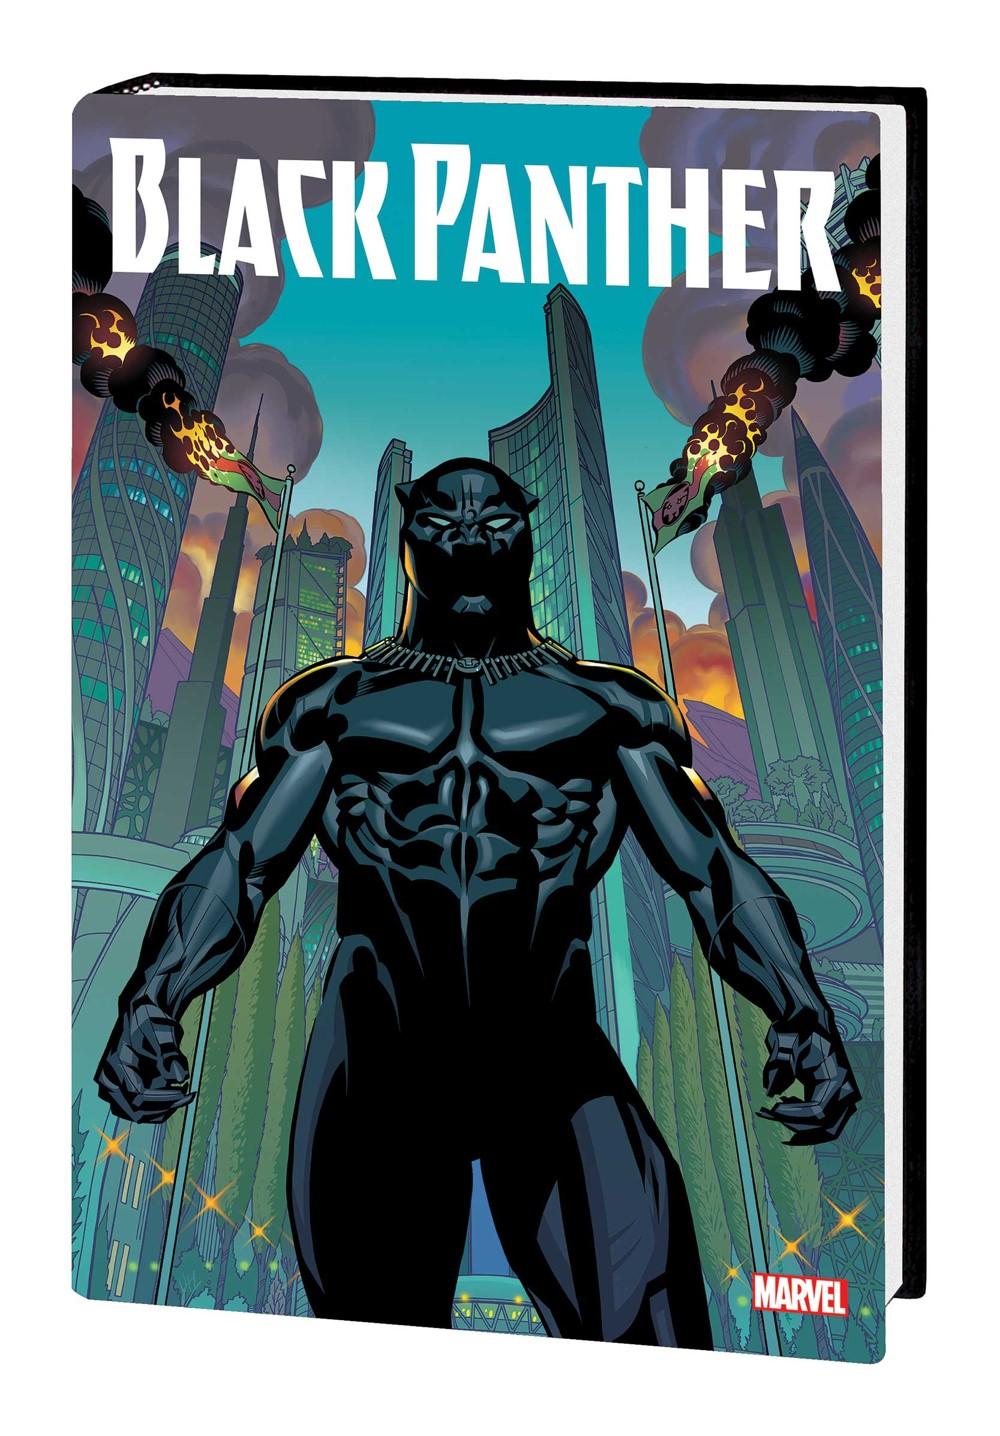 BLAPANTHER_COATES_OMNI_HC_STELFREEZE Marvel Comics December 2021 Solicitations